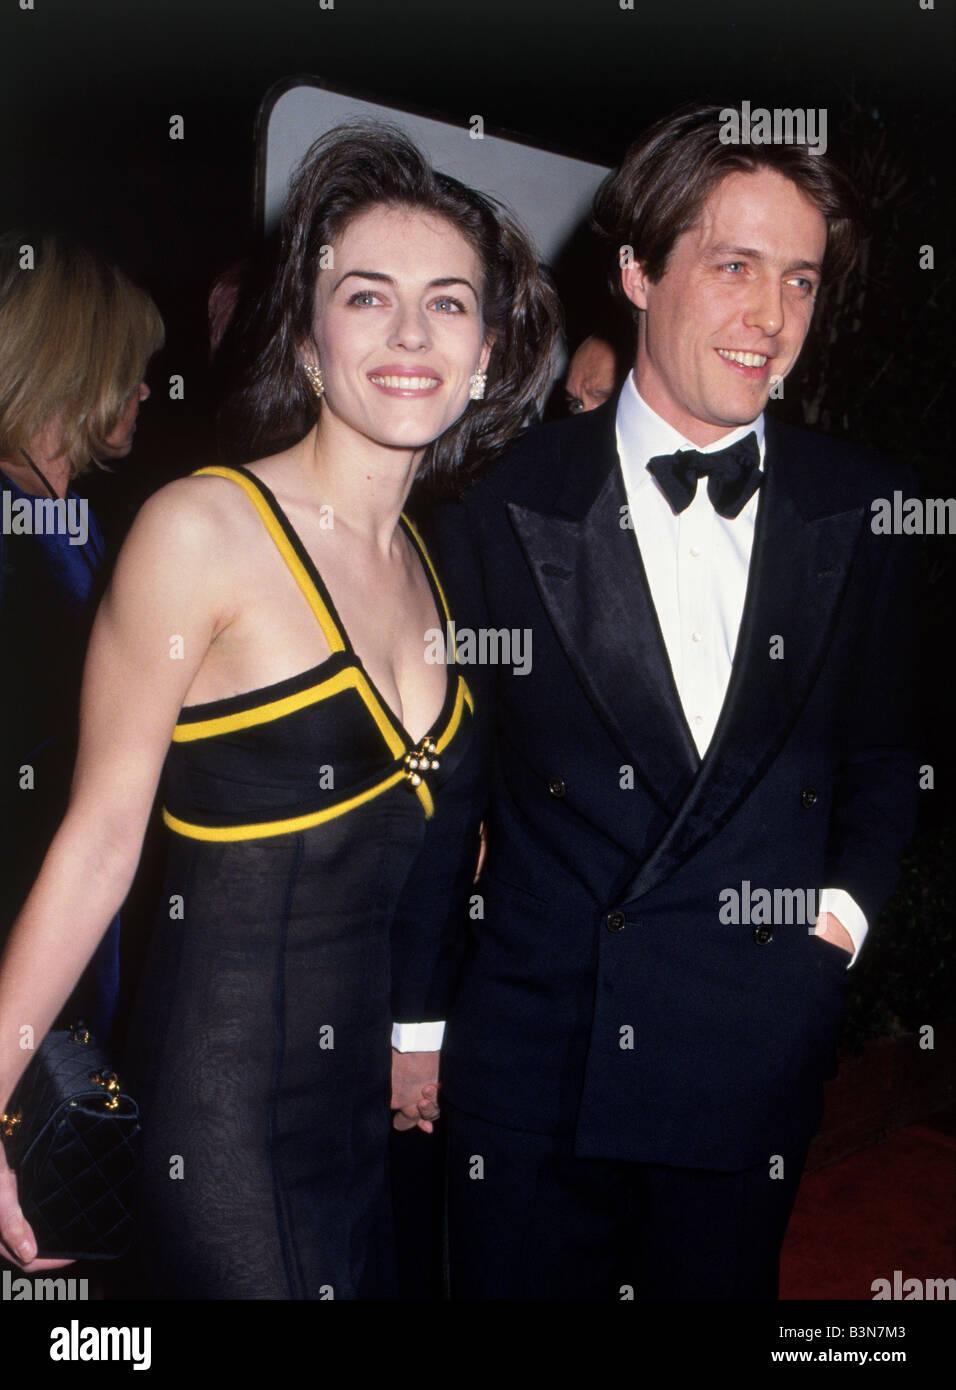 ELIZABETH HURLEY and Hugh Grant - UK actors - Stock Image